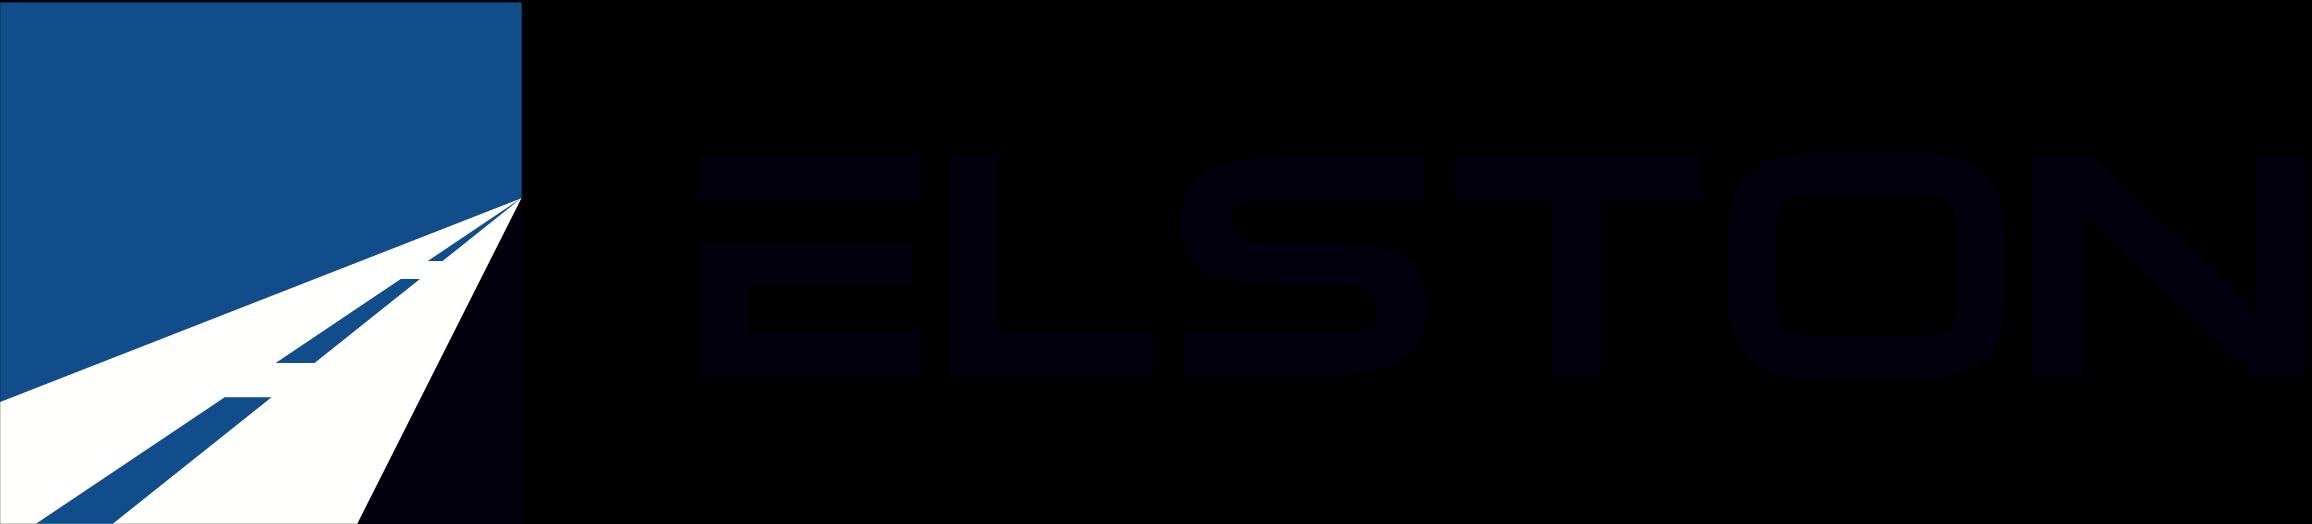 Elston Logo.png